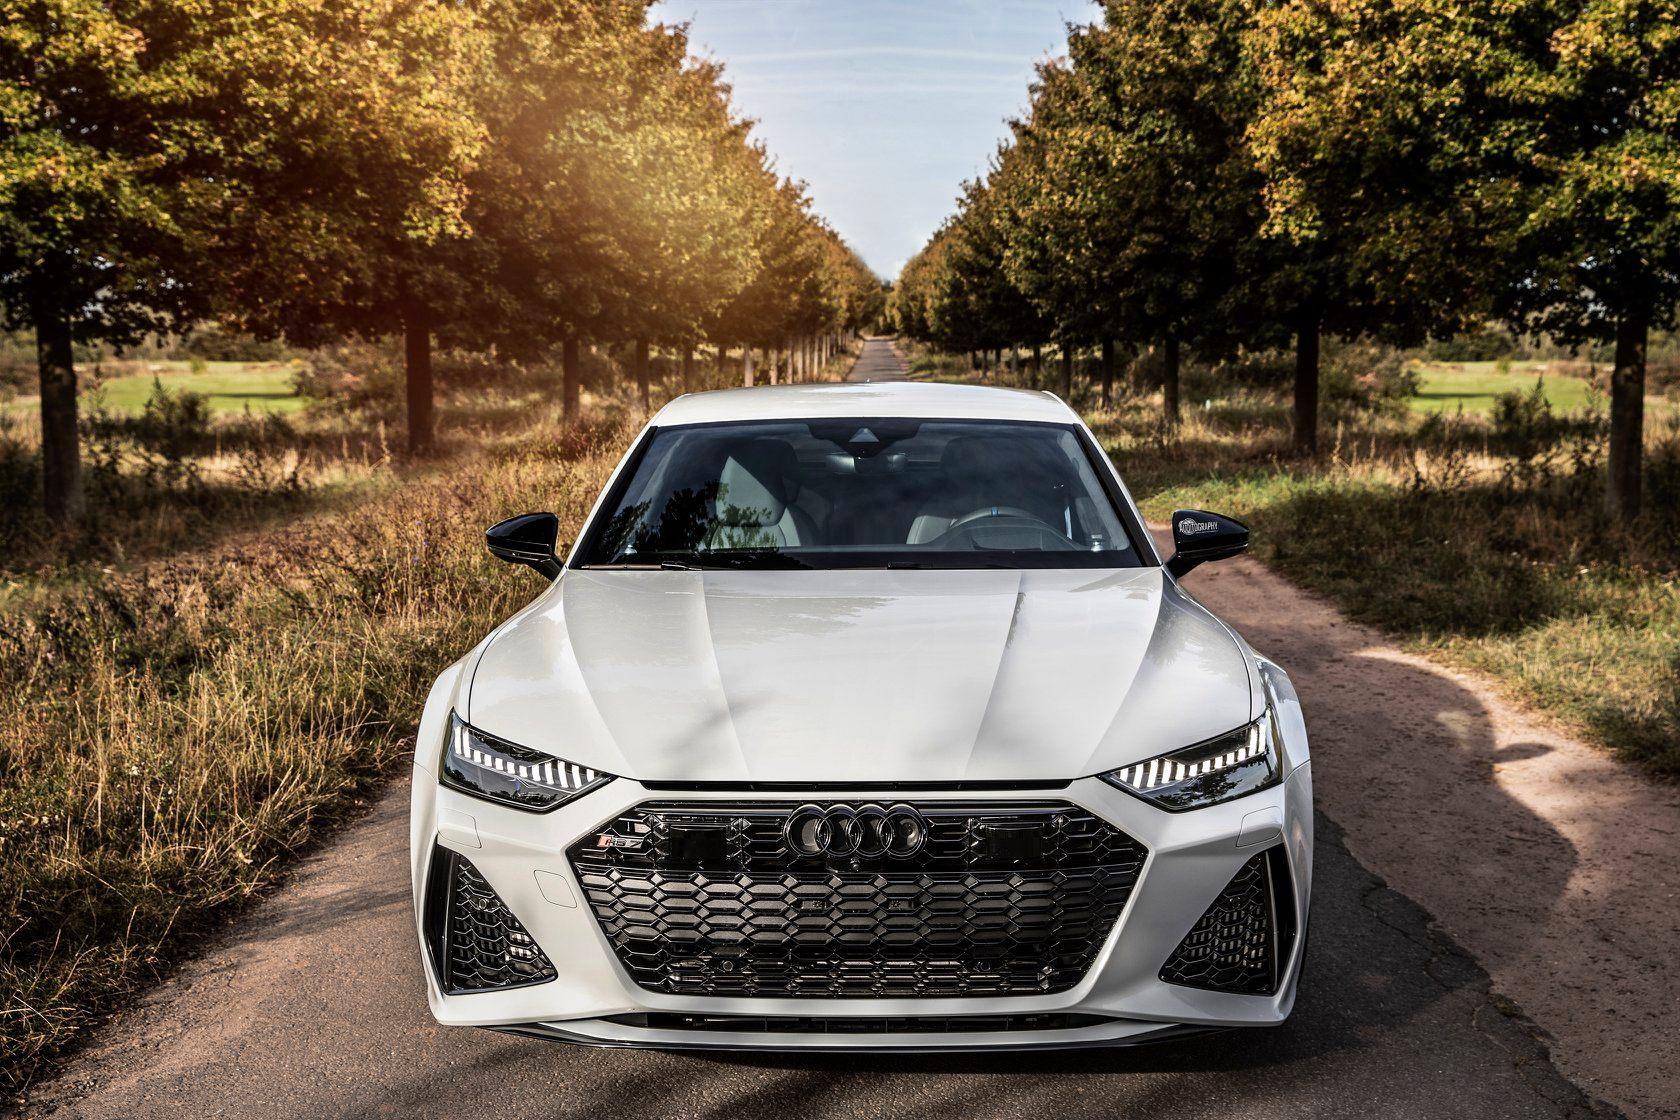 Glacier White 2020 Audi Rs7 Sportback Has Stormtrooper Looks Autoevolution